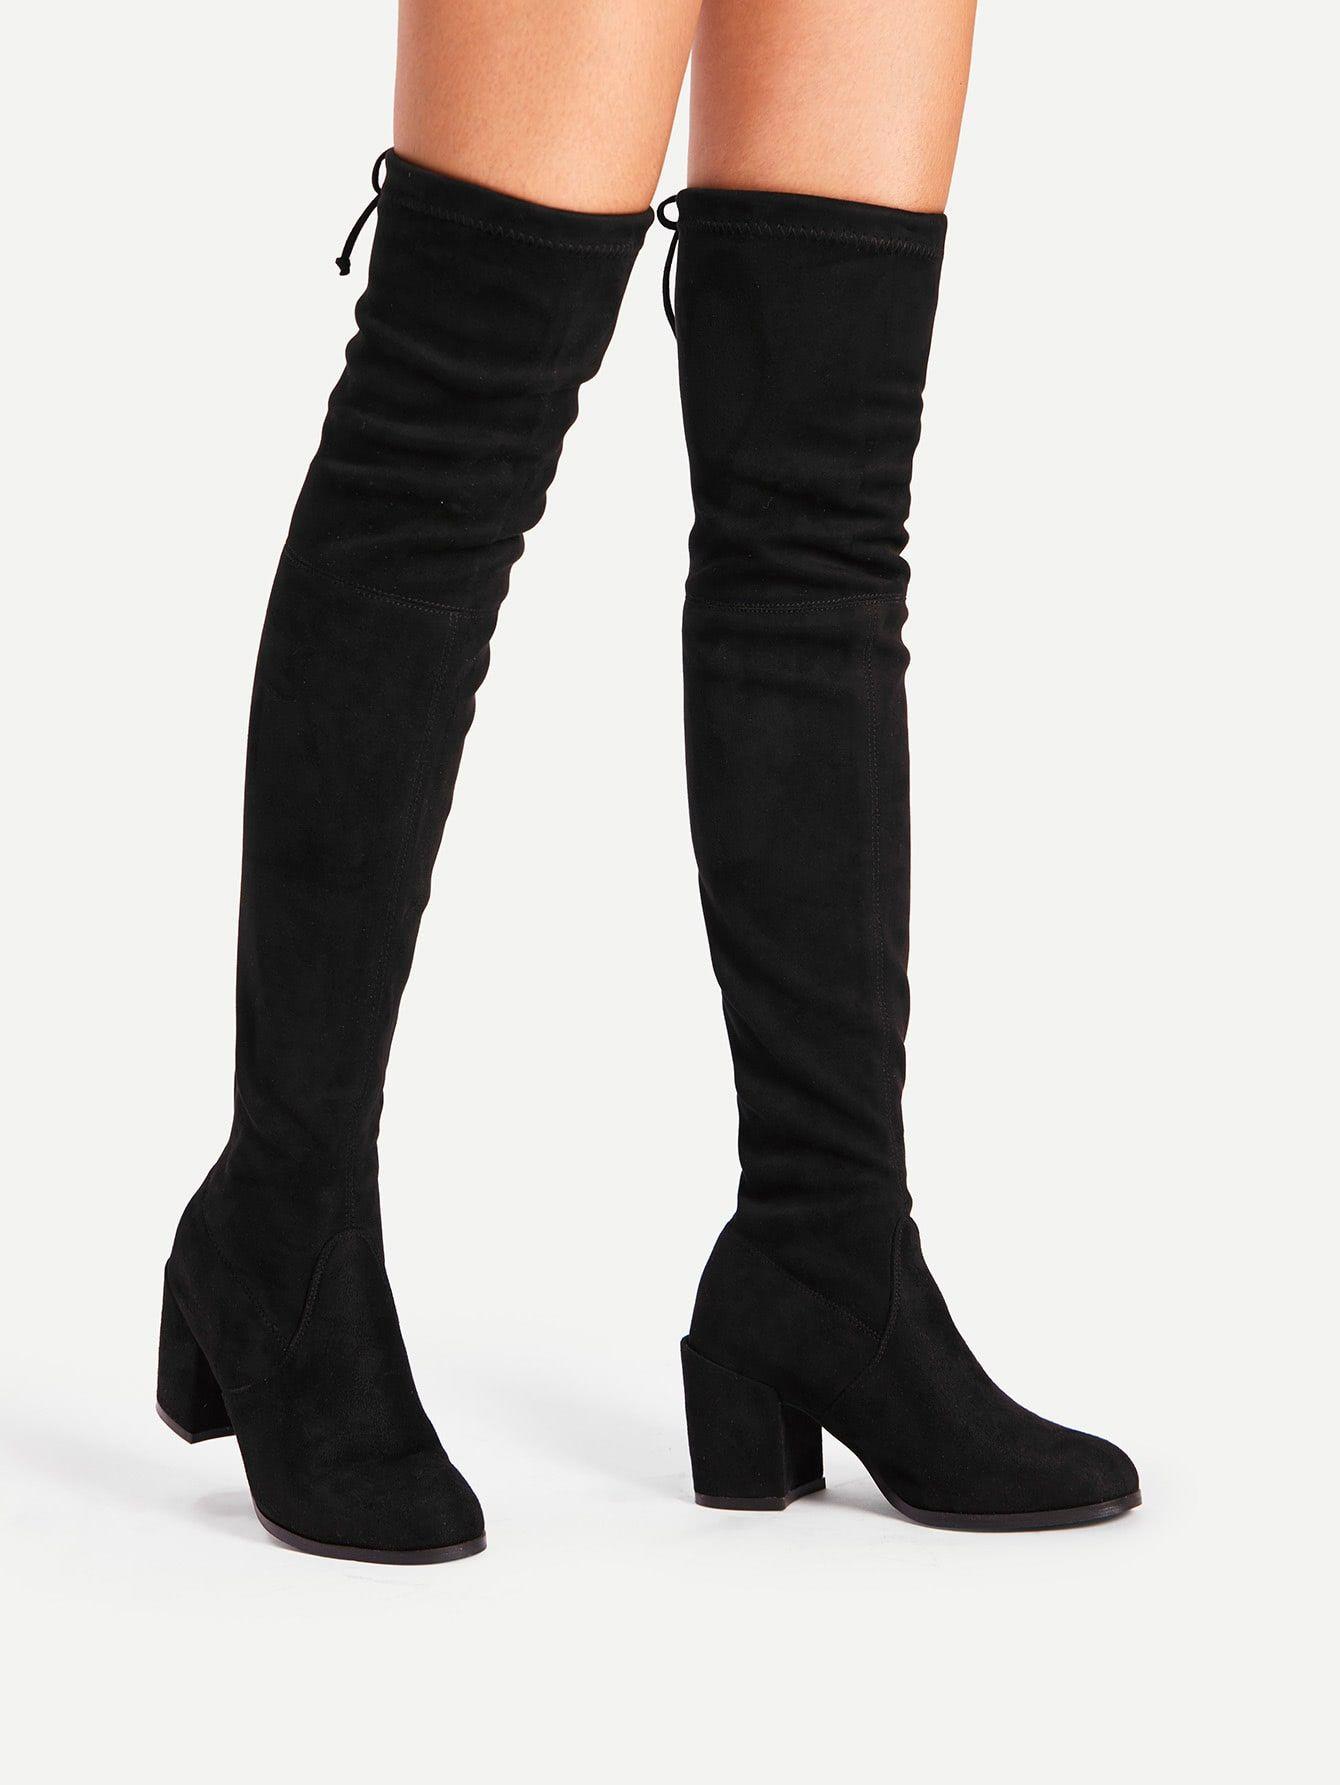 Elegant Almond Toe Otk Thigh High No Zipper Black Mid Heel Chunky Tie Back Over Knee Block Heeled Boots Block Heel Boots Black High Boots Boots